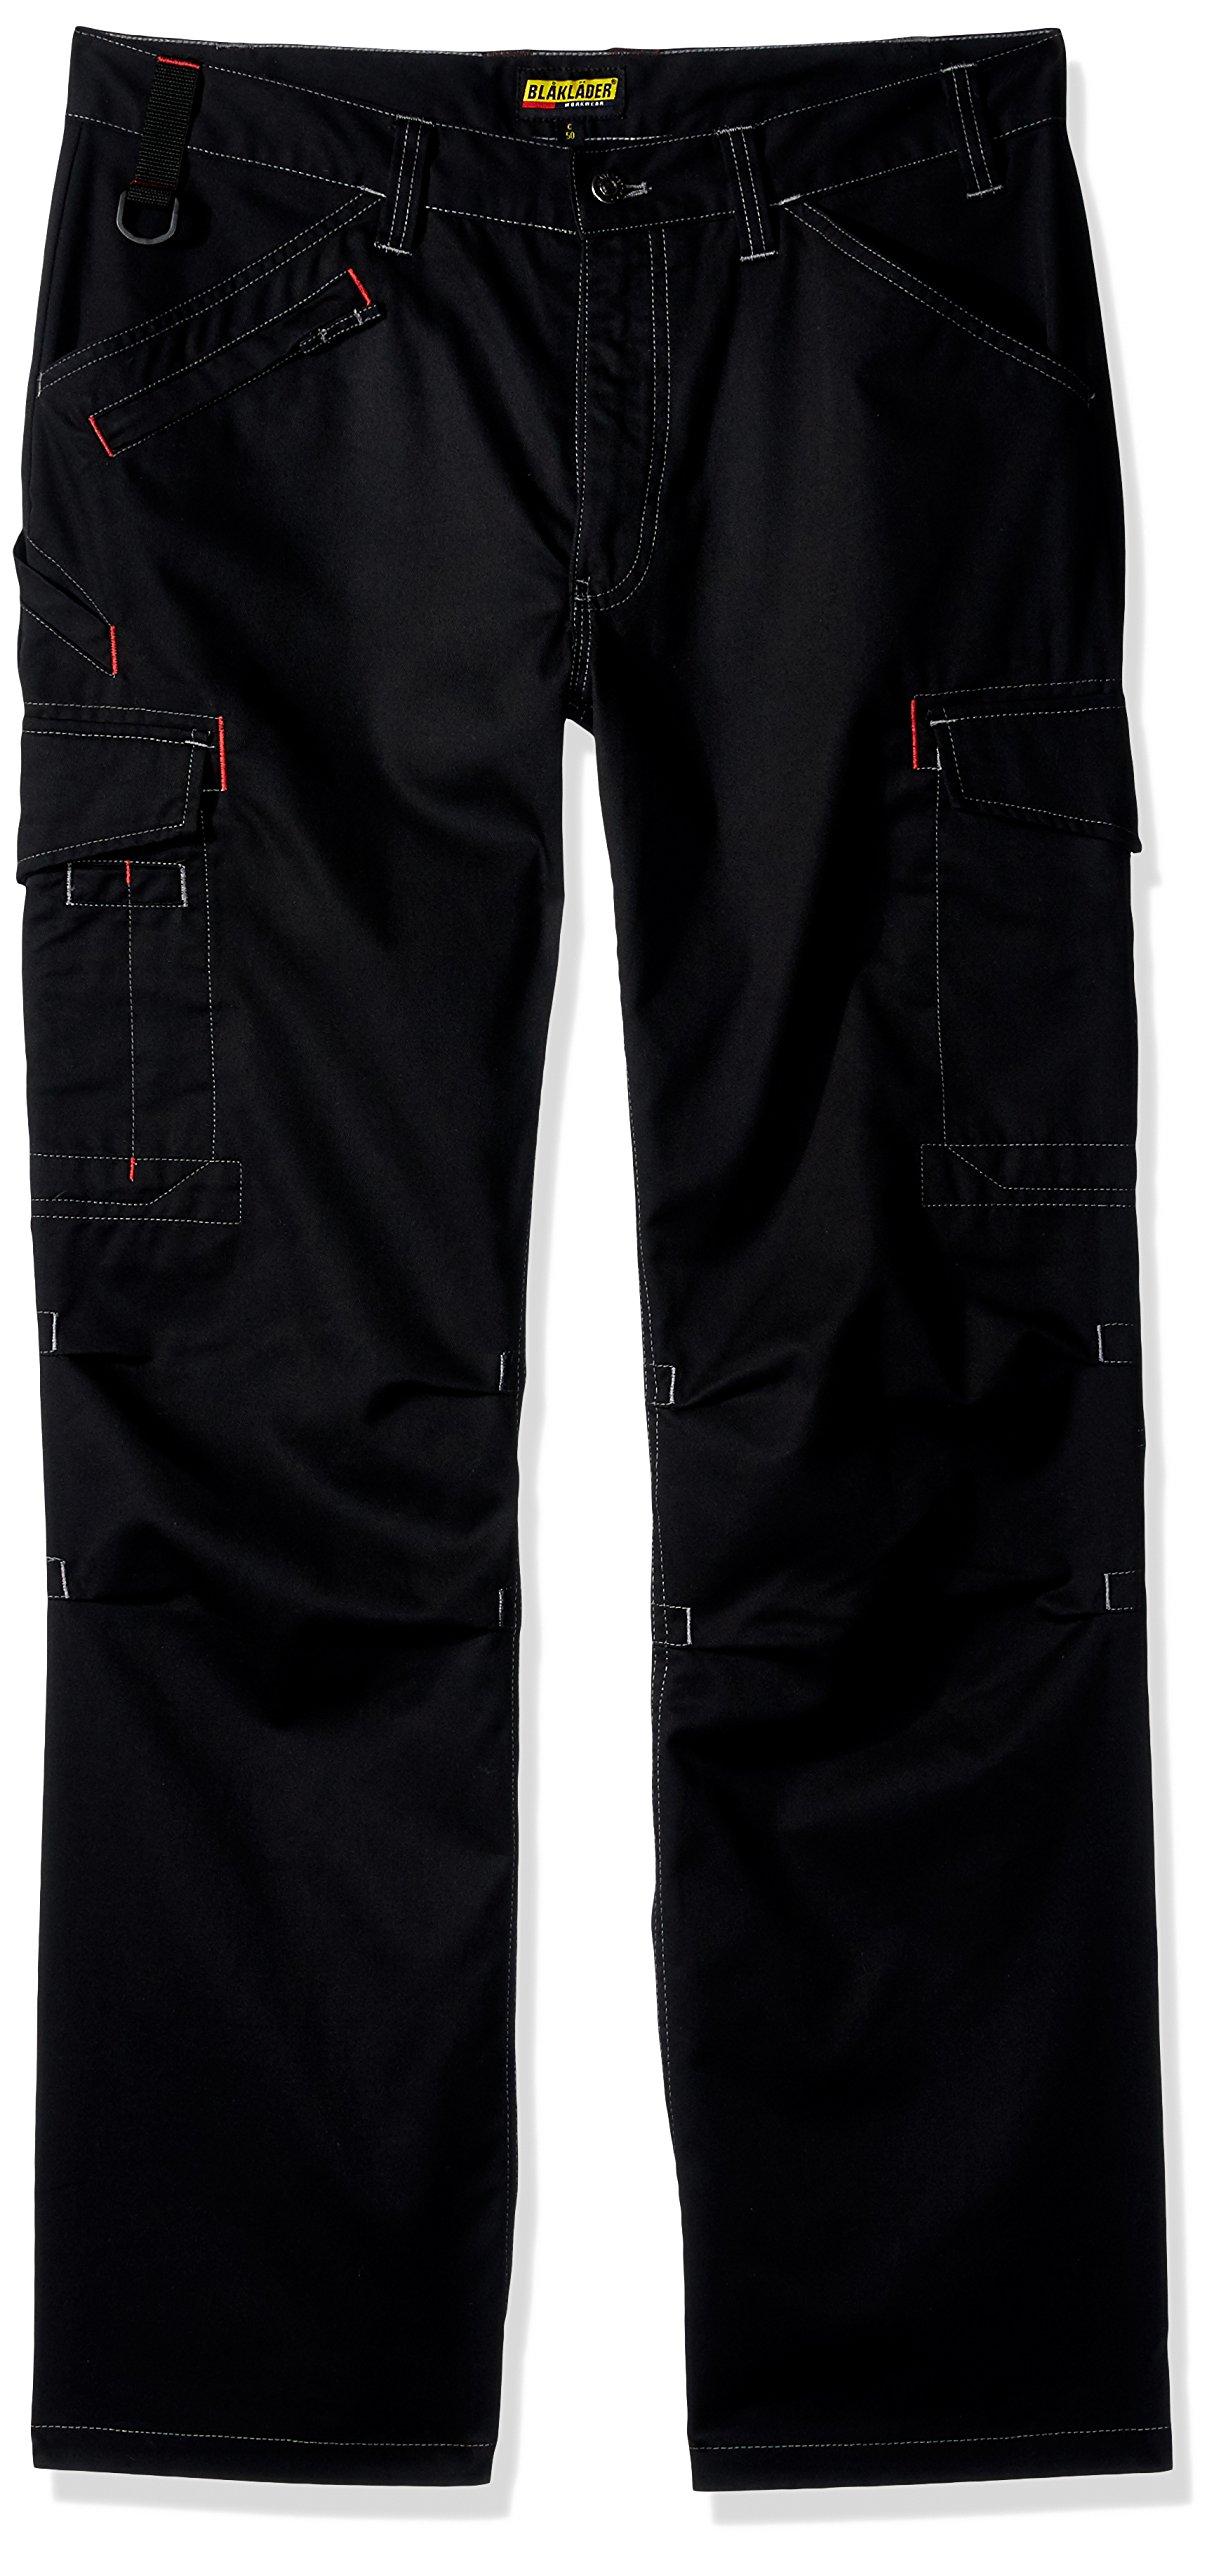 Blaklader 140318009900D100 Cargo Trousers, Size 36/30, Black